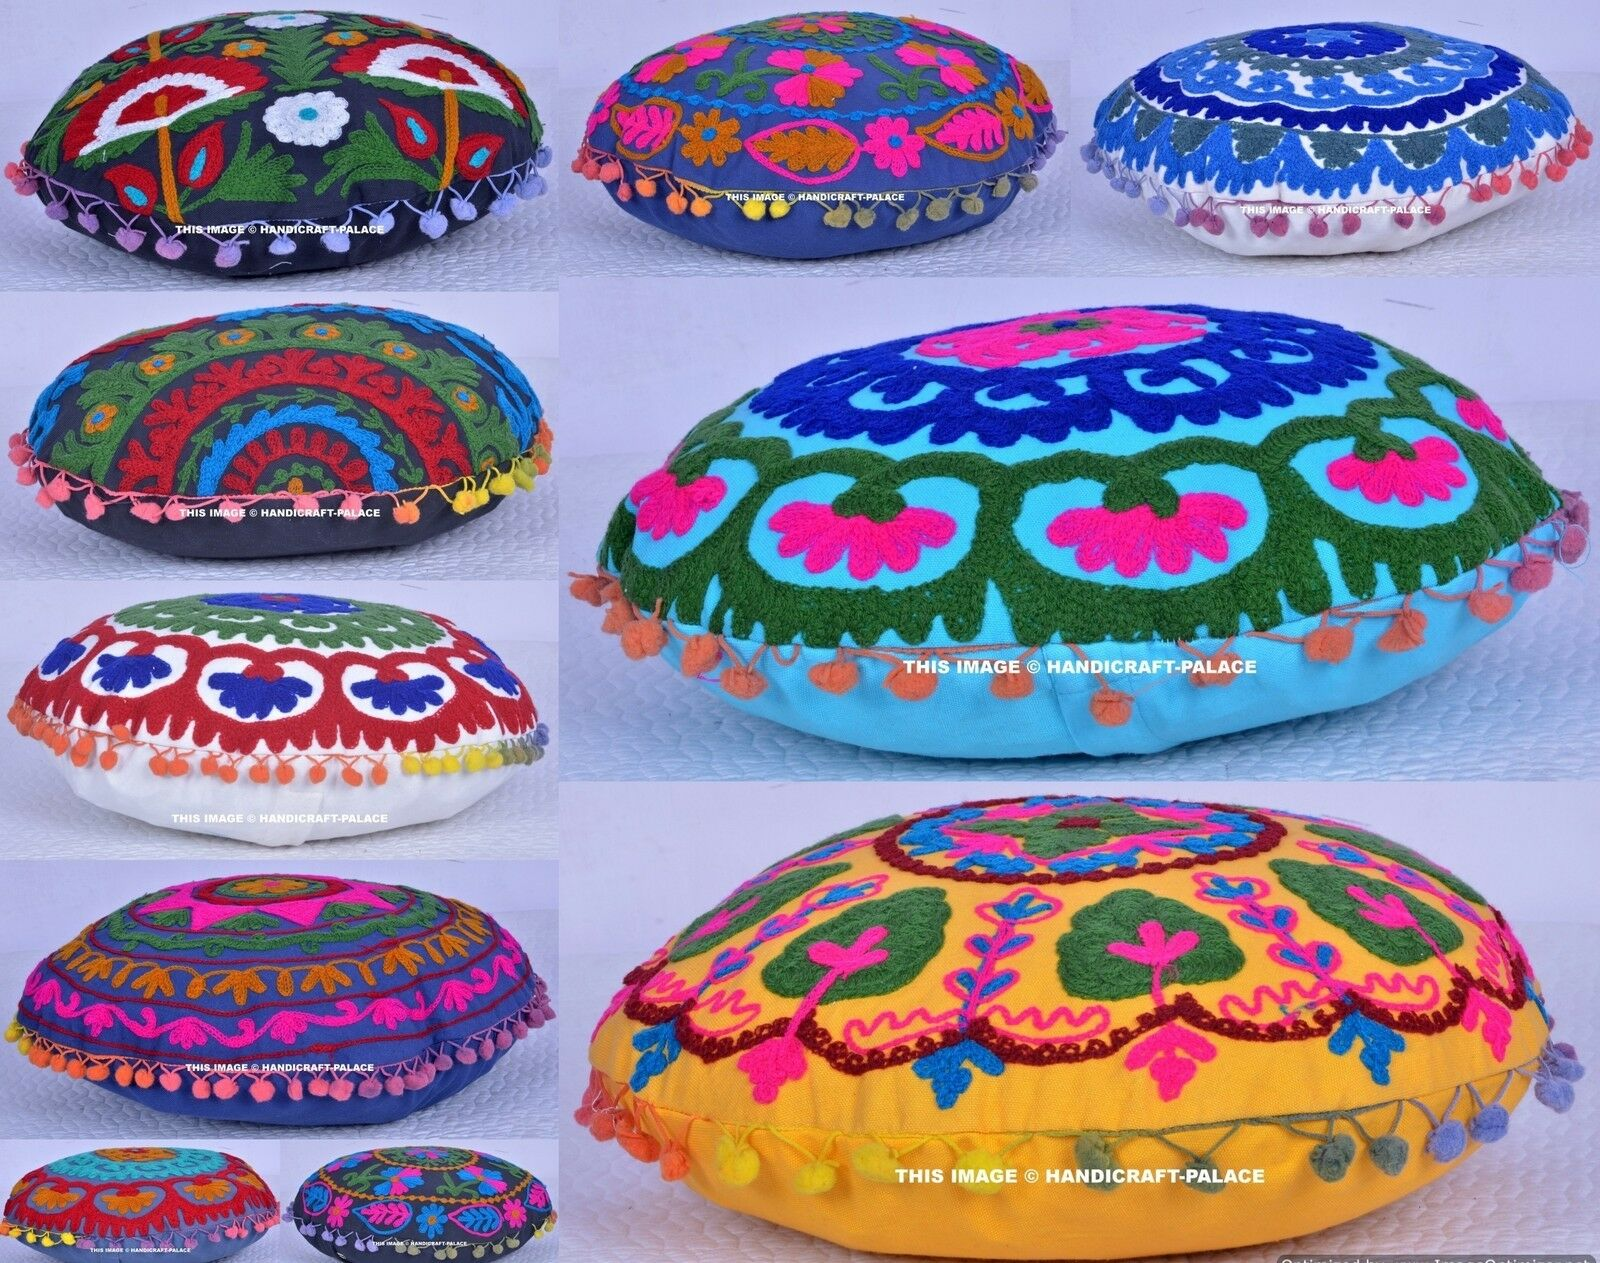 10 Pc Wholesale Lot SUZANI EMBROIDErot PILLOW CUSHION COVER Farbeful Decorative